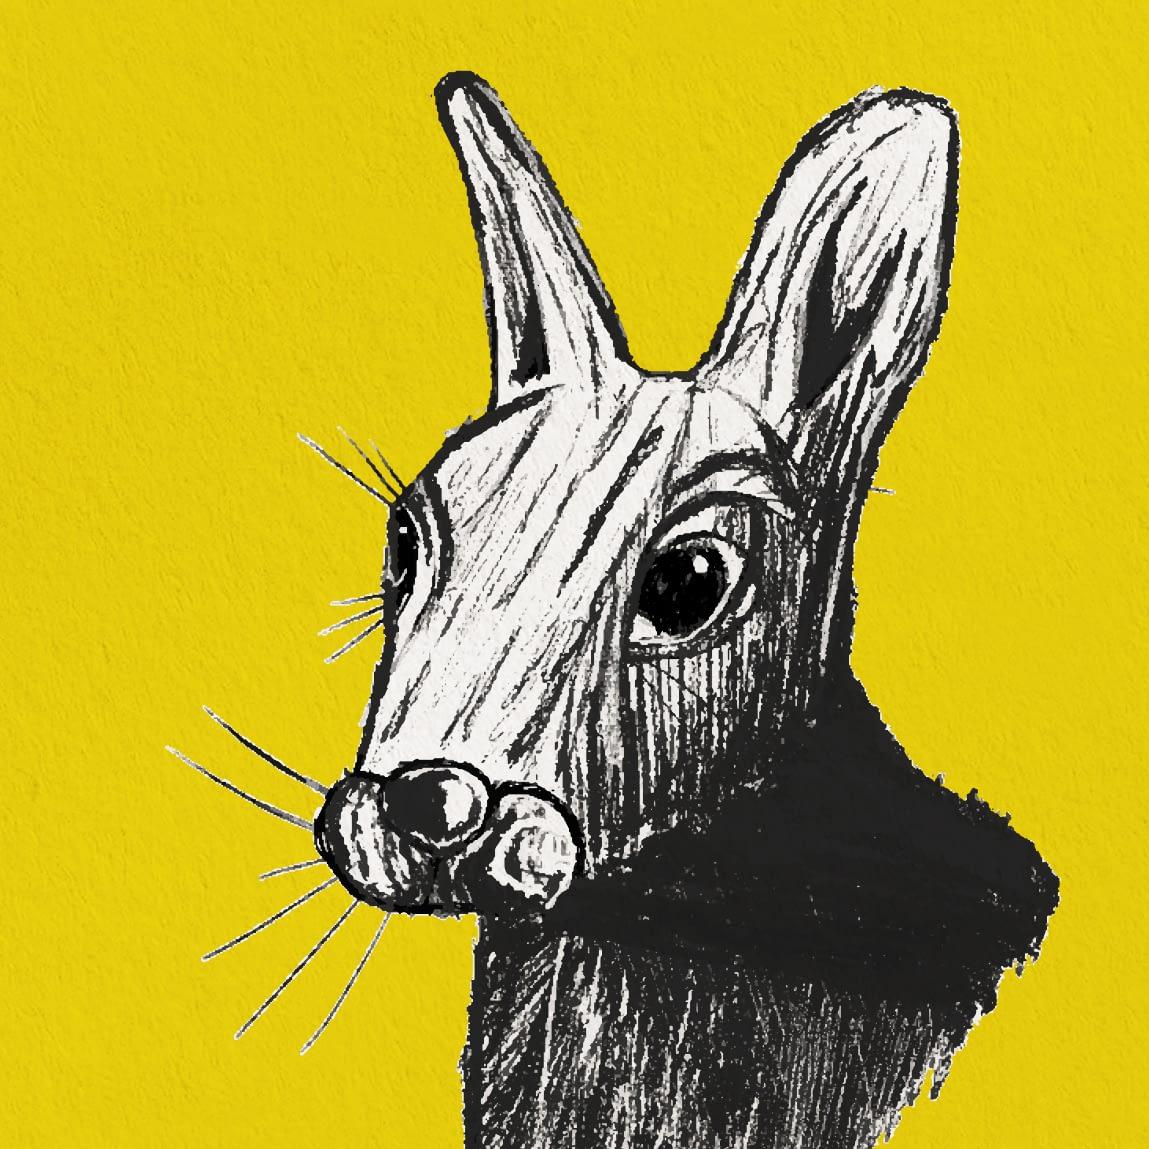 Rabbit Print Zoomed